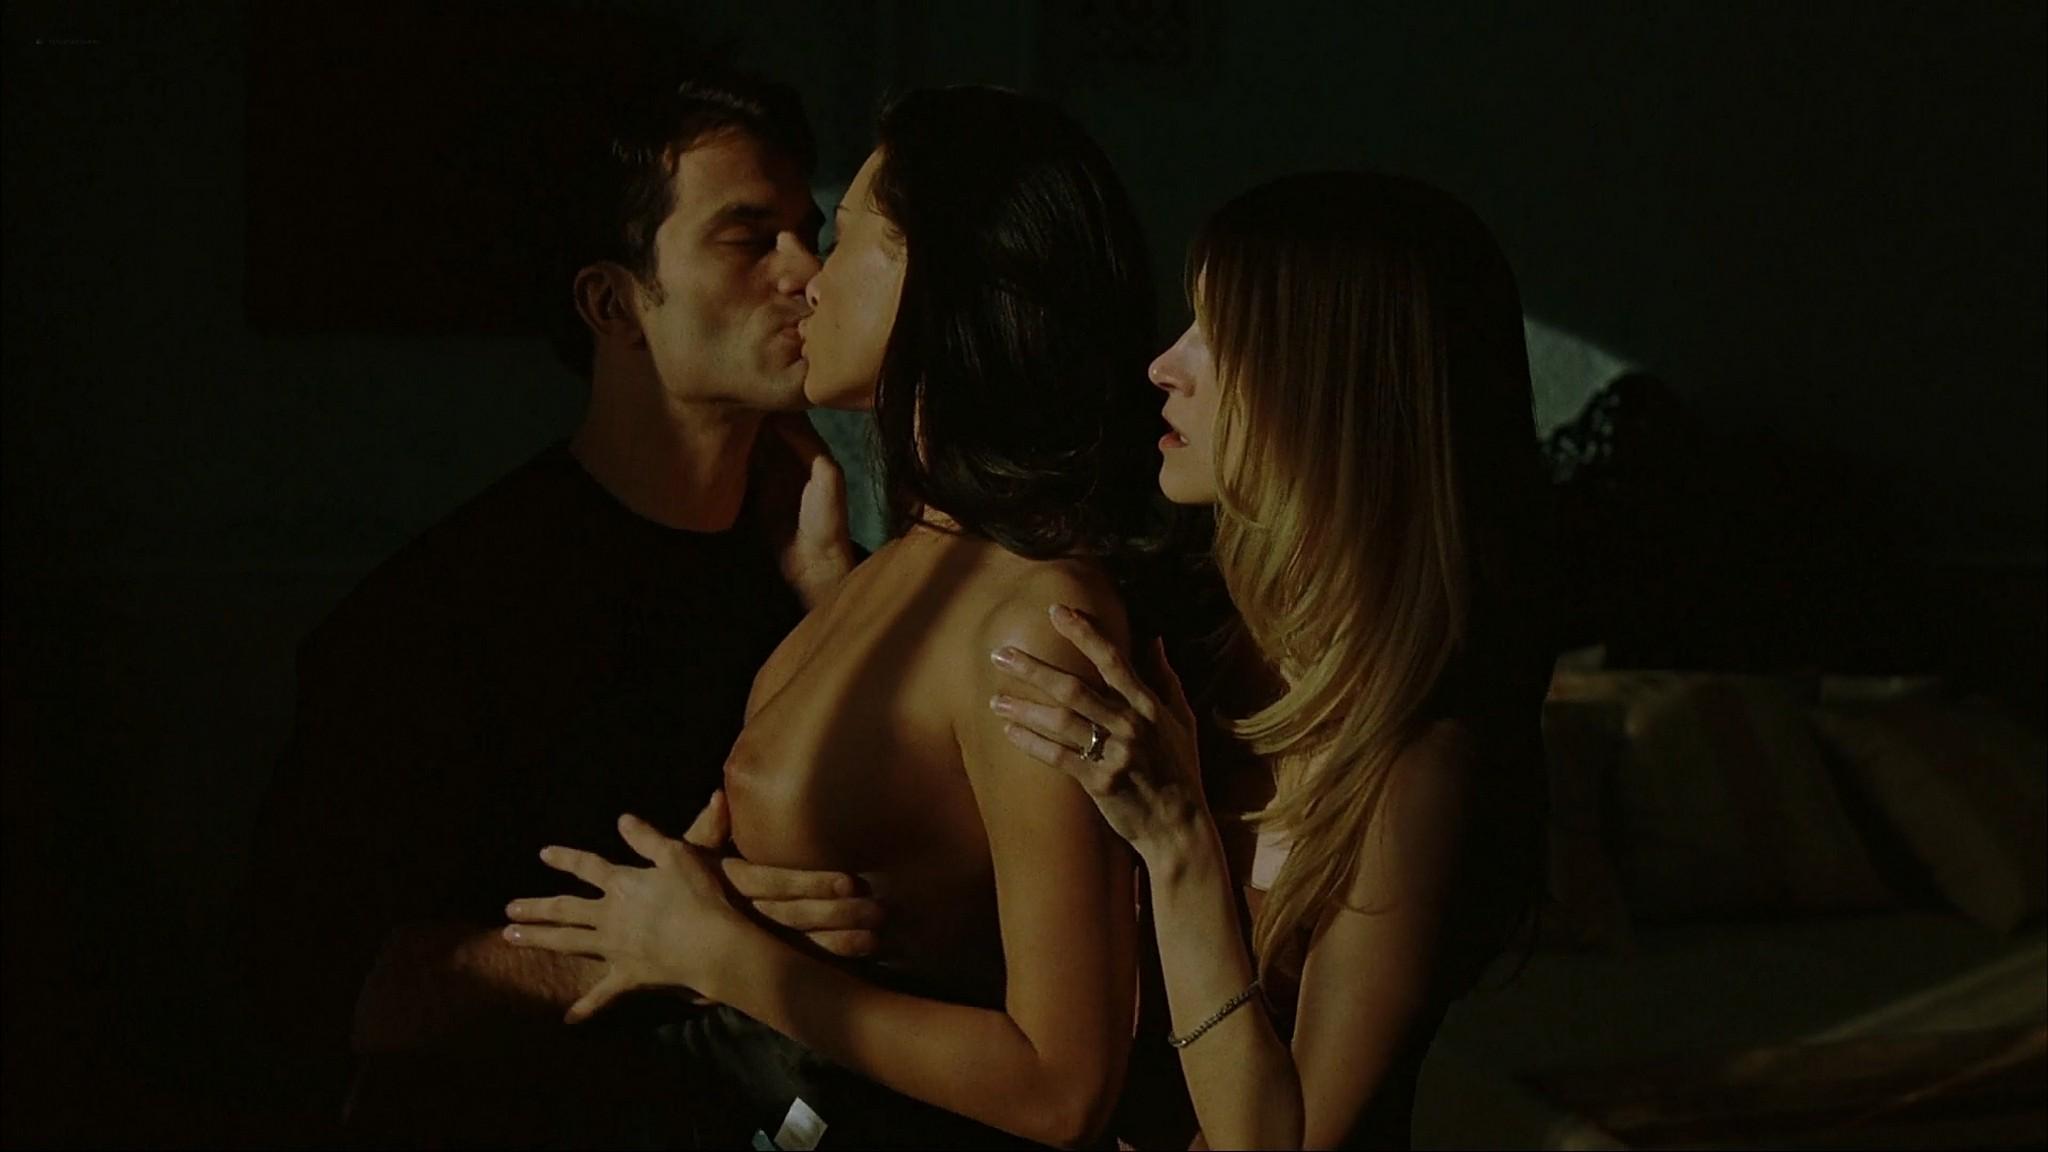 Lori Heuring nude sex threesome Zita Gorog Francesca Kingdon Judit Viktor and Sandra Shine all nude full frontal 8MM 2 2005 1080p Web 6